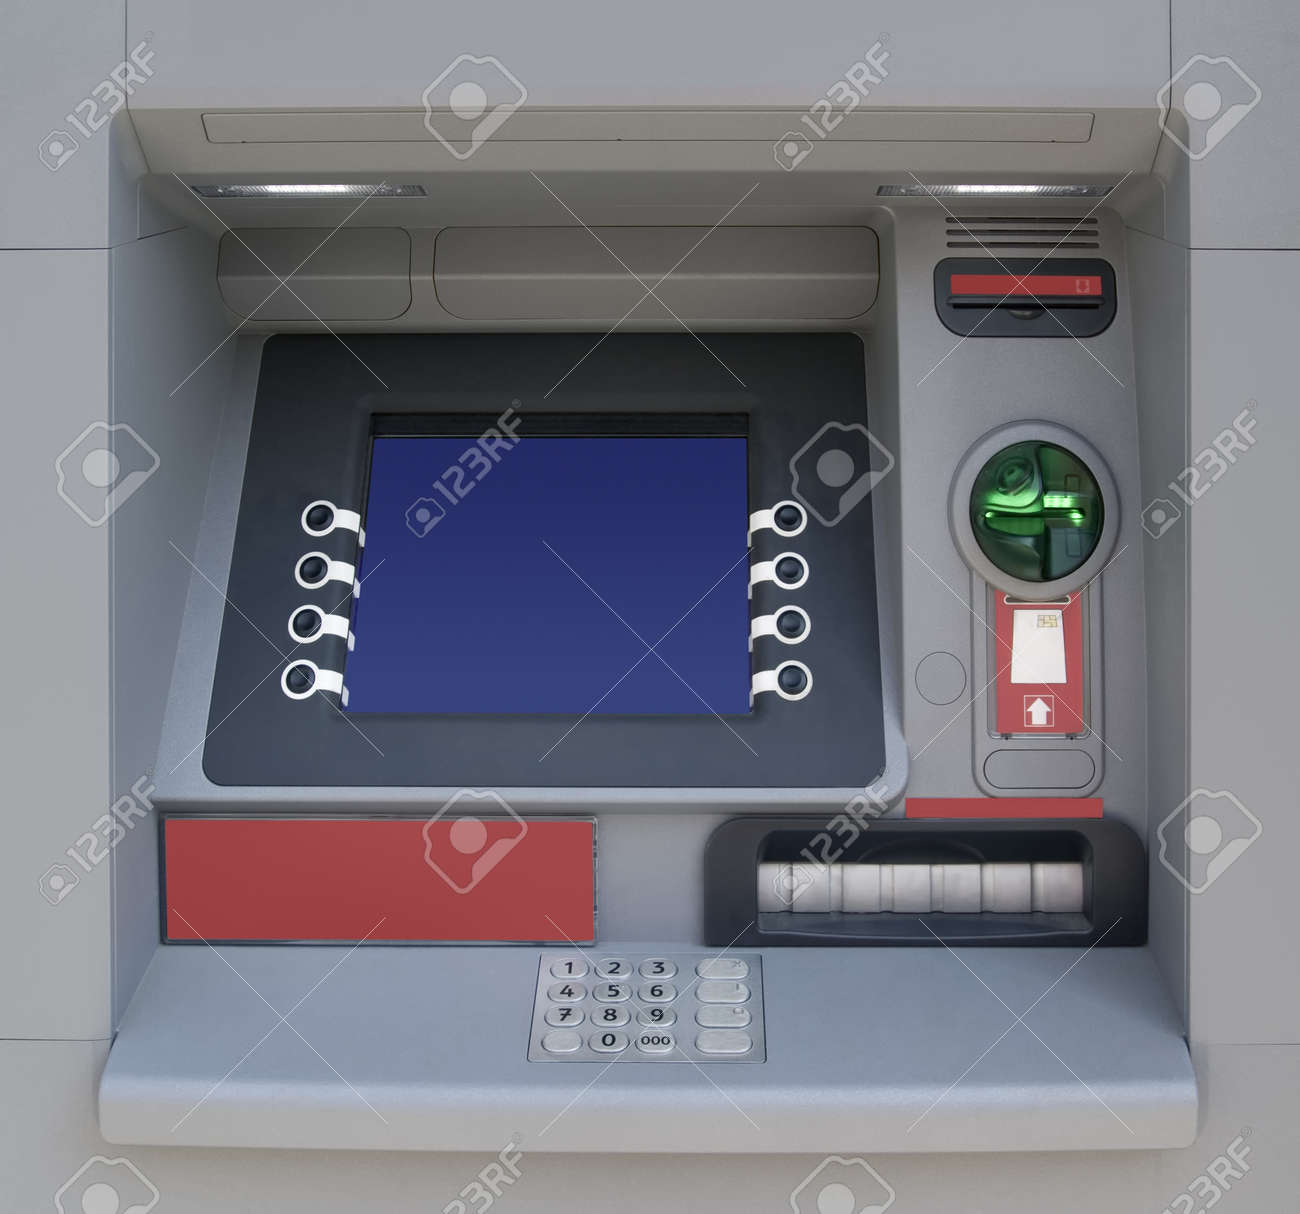 Automatic Teller Machine with Blank Screen Standard-Bild - 18650198